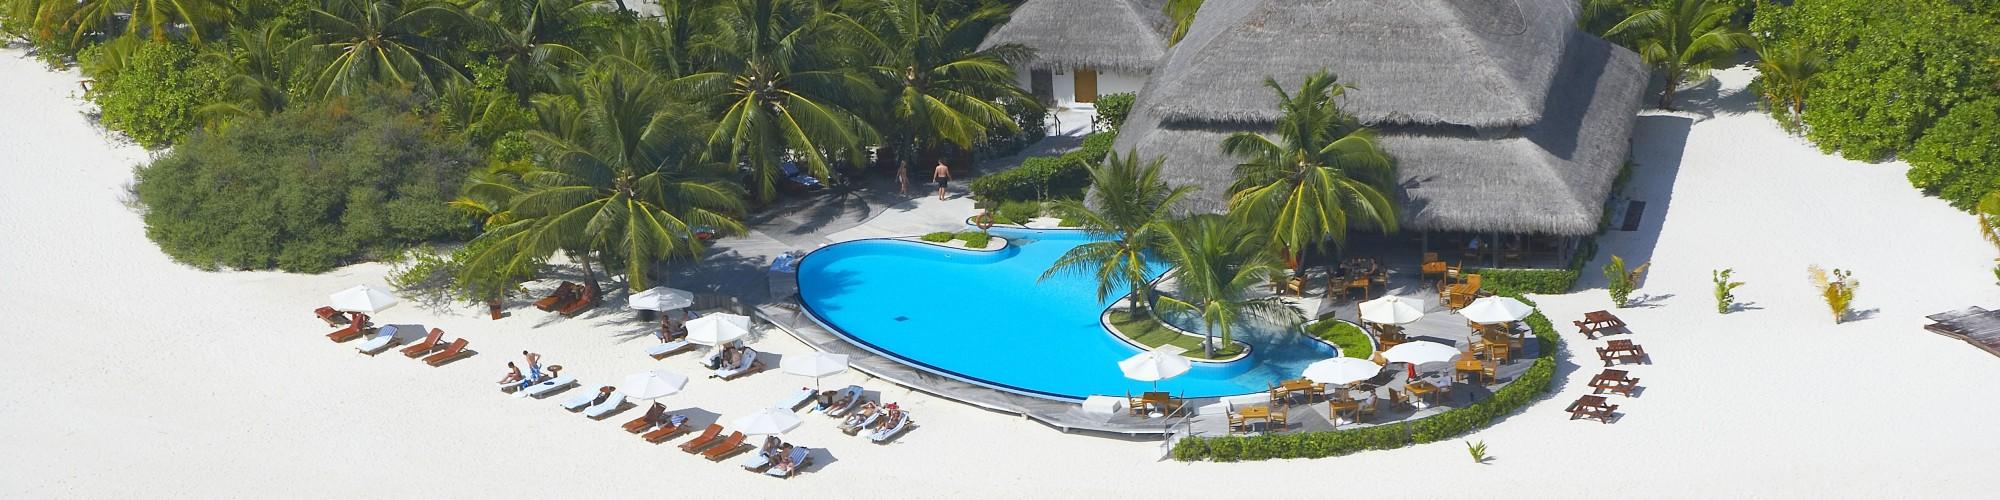 Sunset Bar n Pool